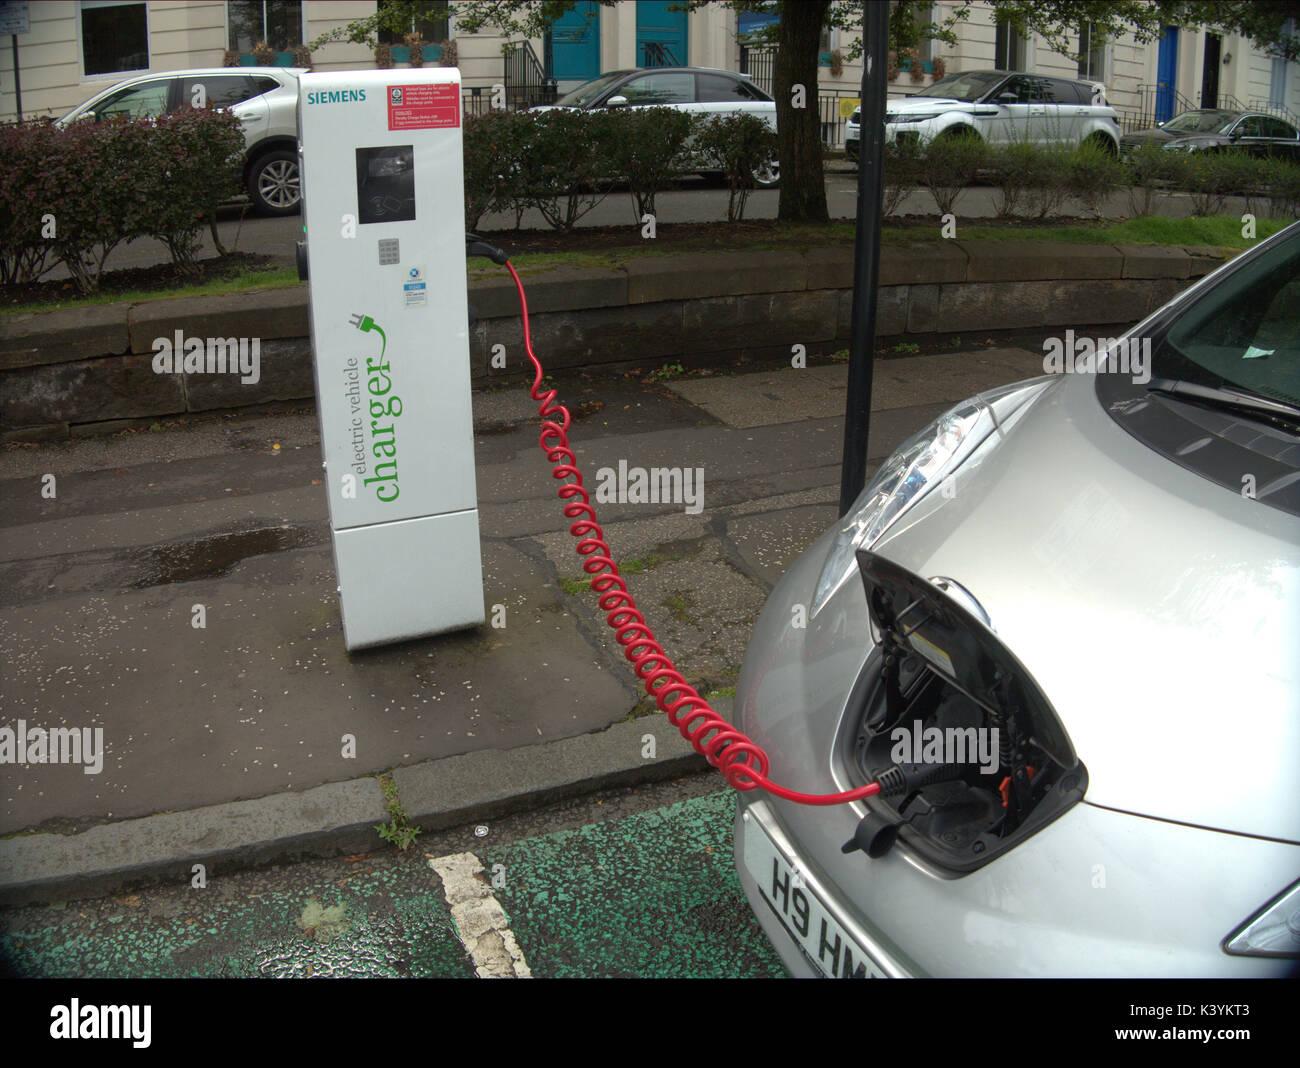 Auto angeschlossene elektrische Auto Ladegerät Punkt mit Symbolen ...